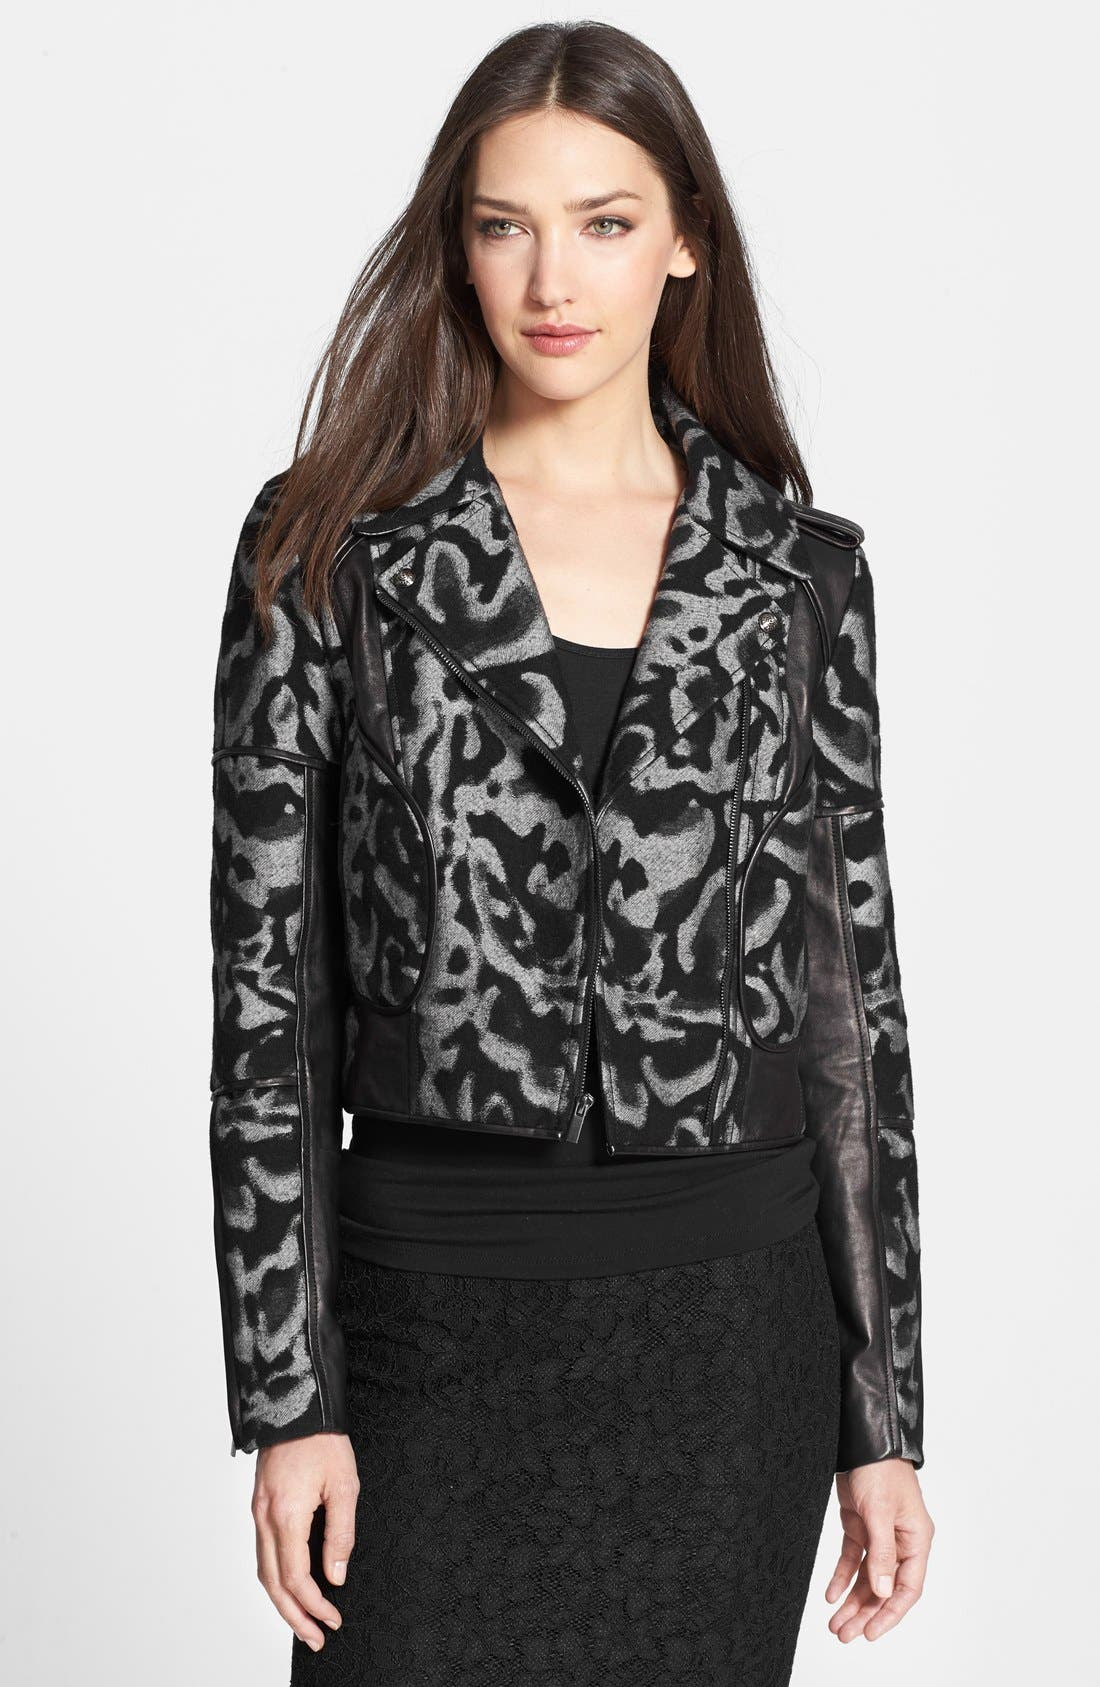 Alternate Image 1 Selected - Diane von Furstenberg 'Theodora Leo' Leather Accent Jacket